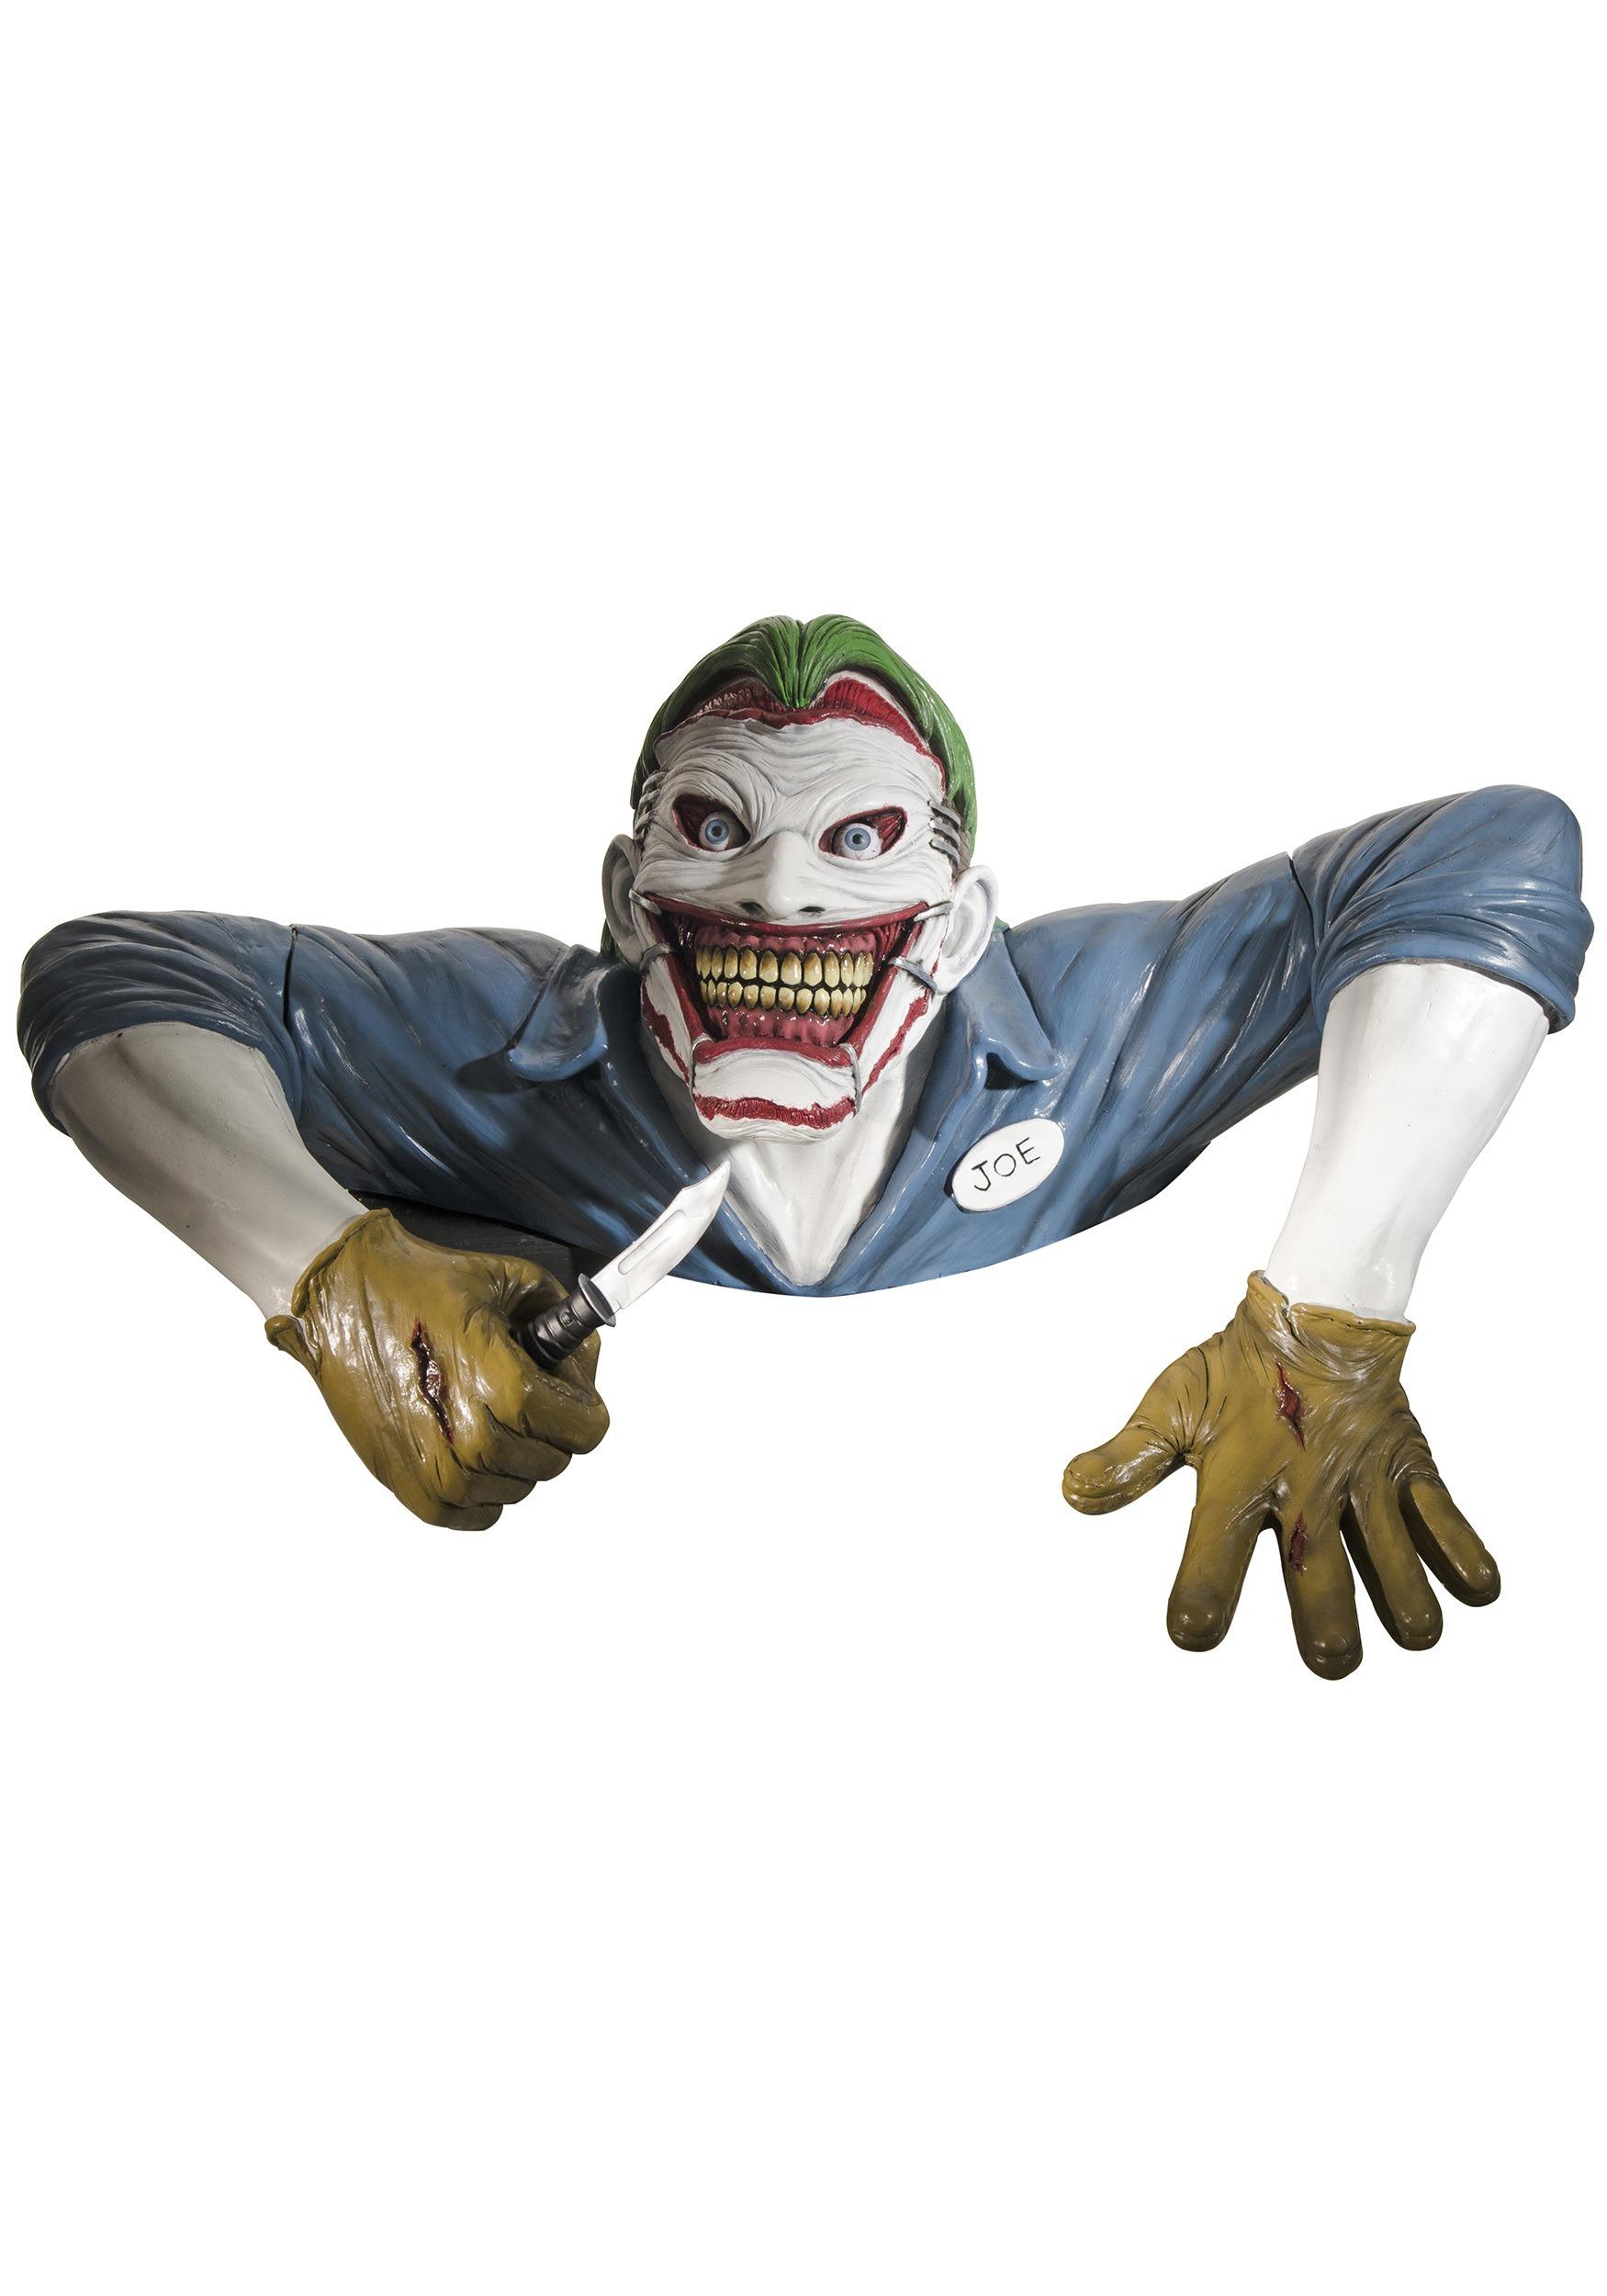 The Joker Death of the Family Groundbreaker RU68593